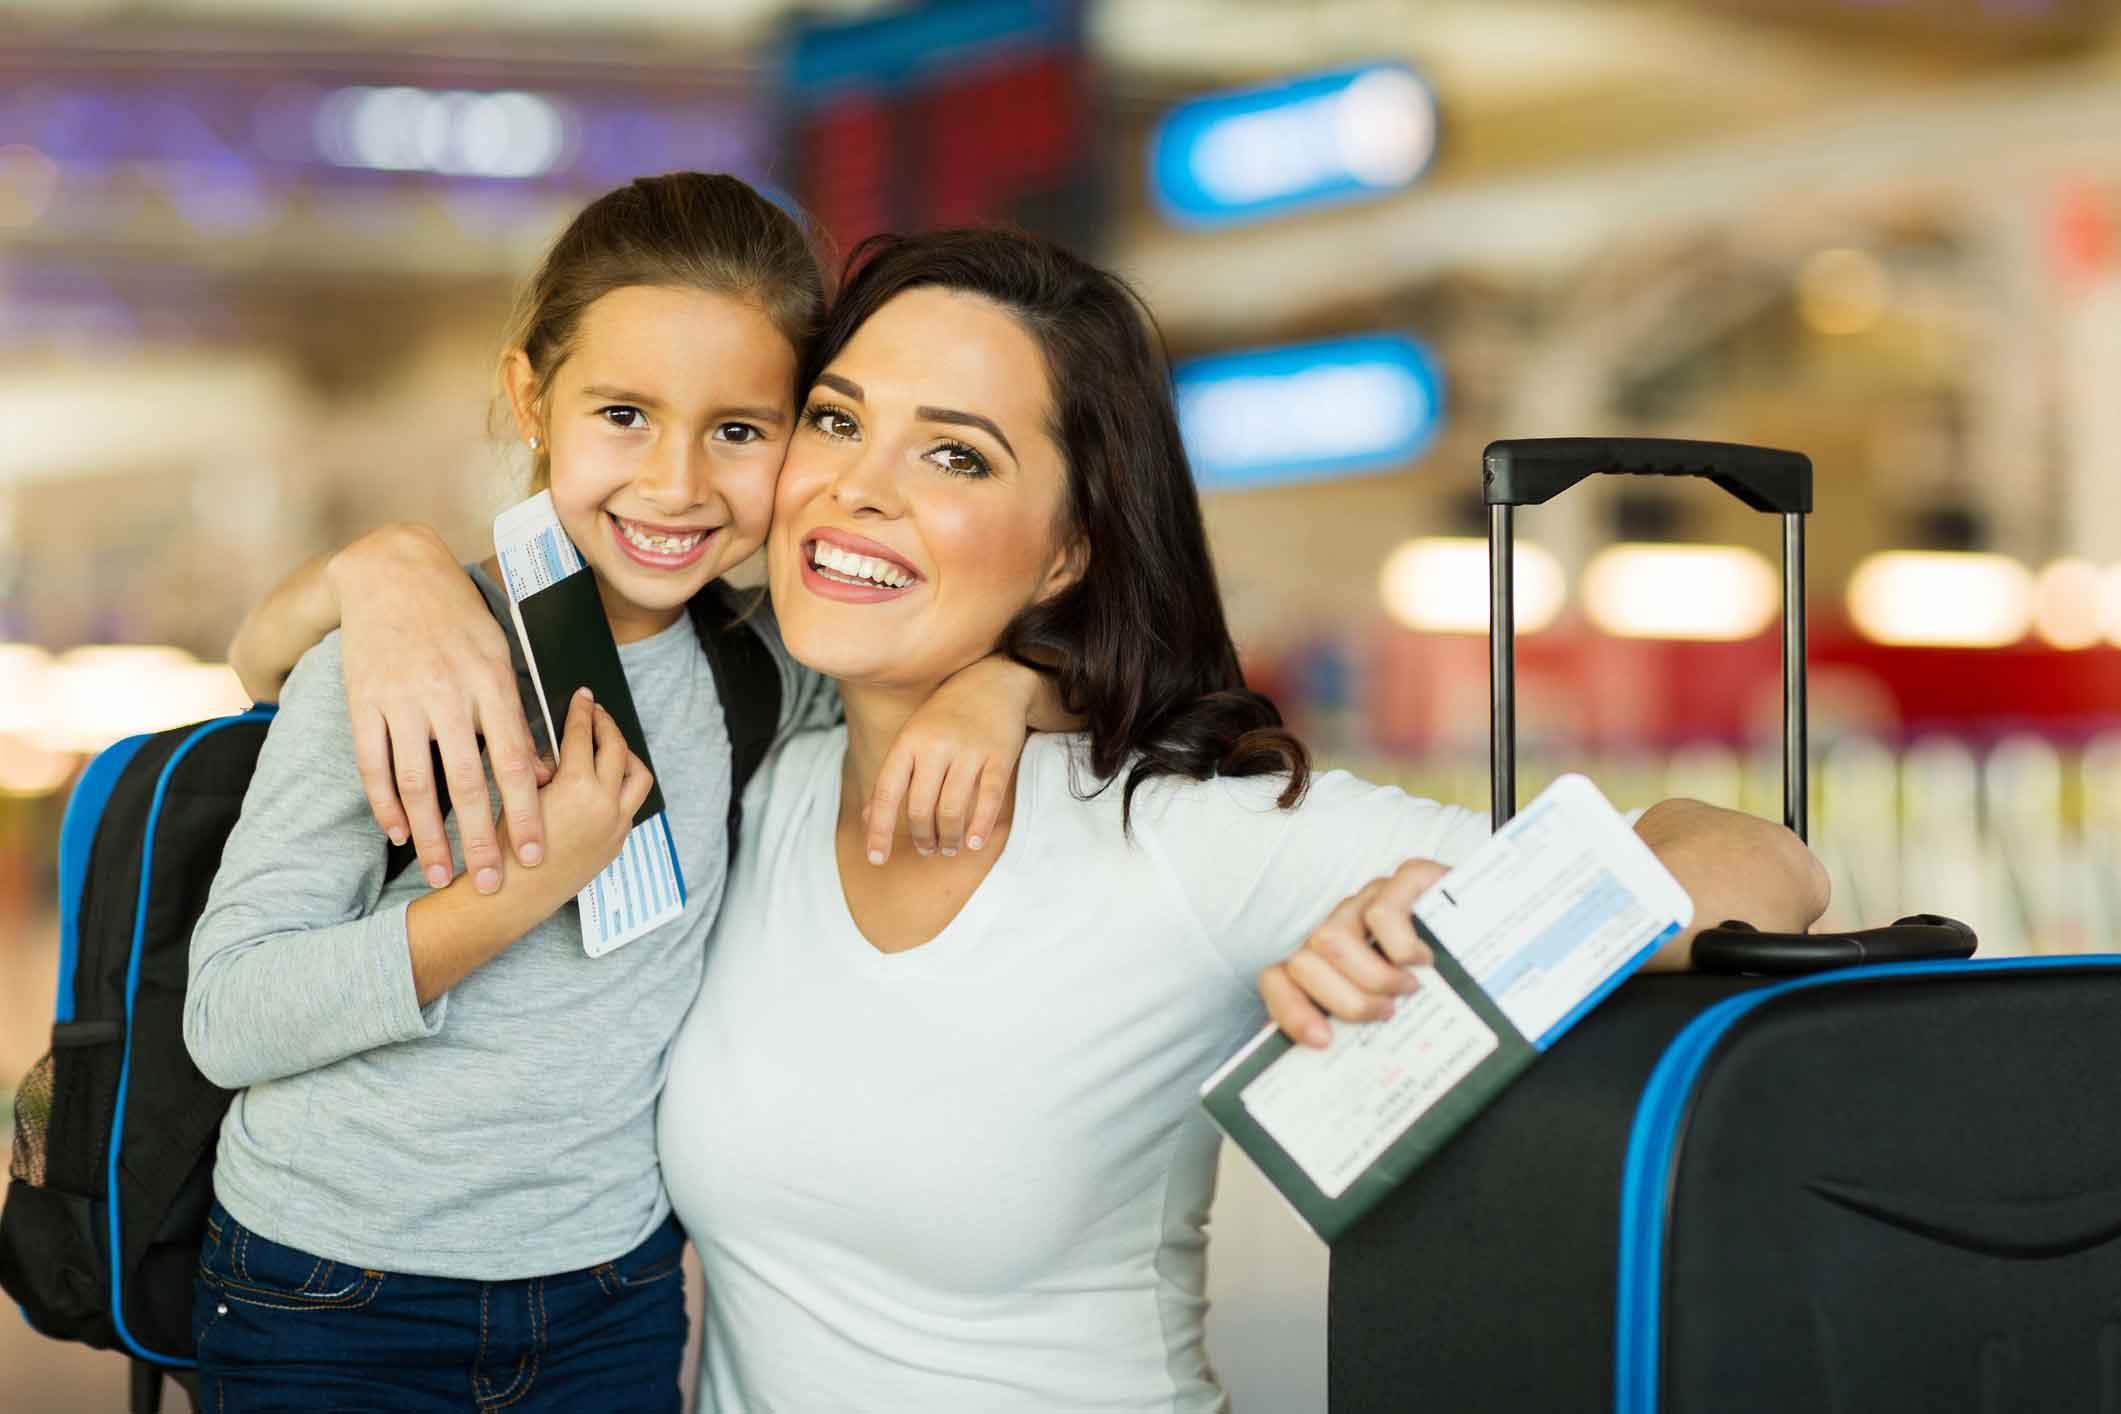 Dental Emergencies When Traveling